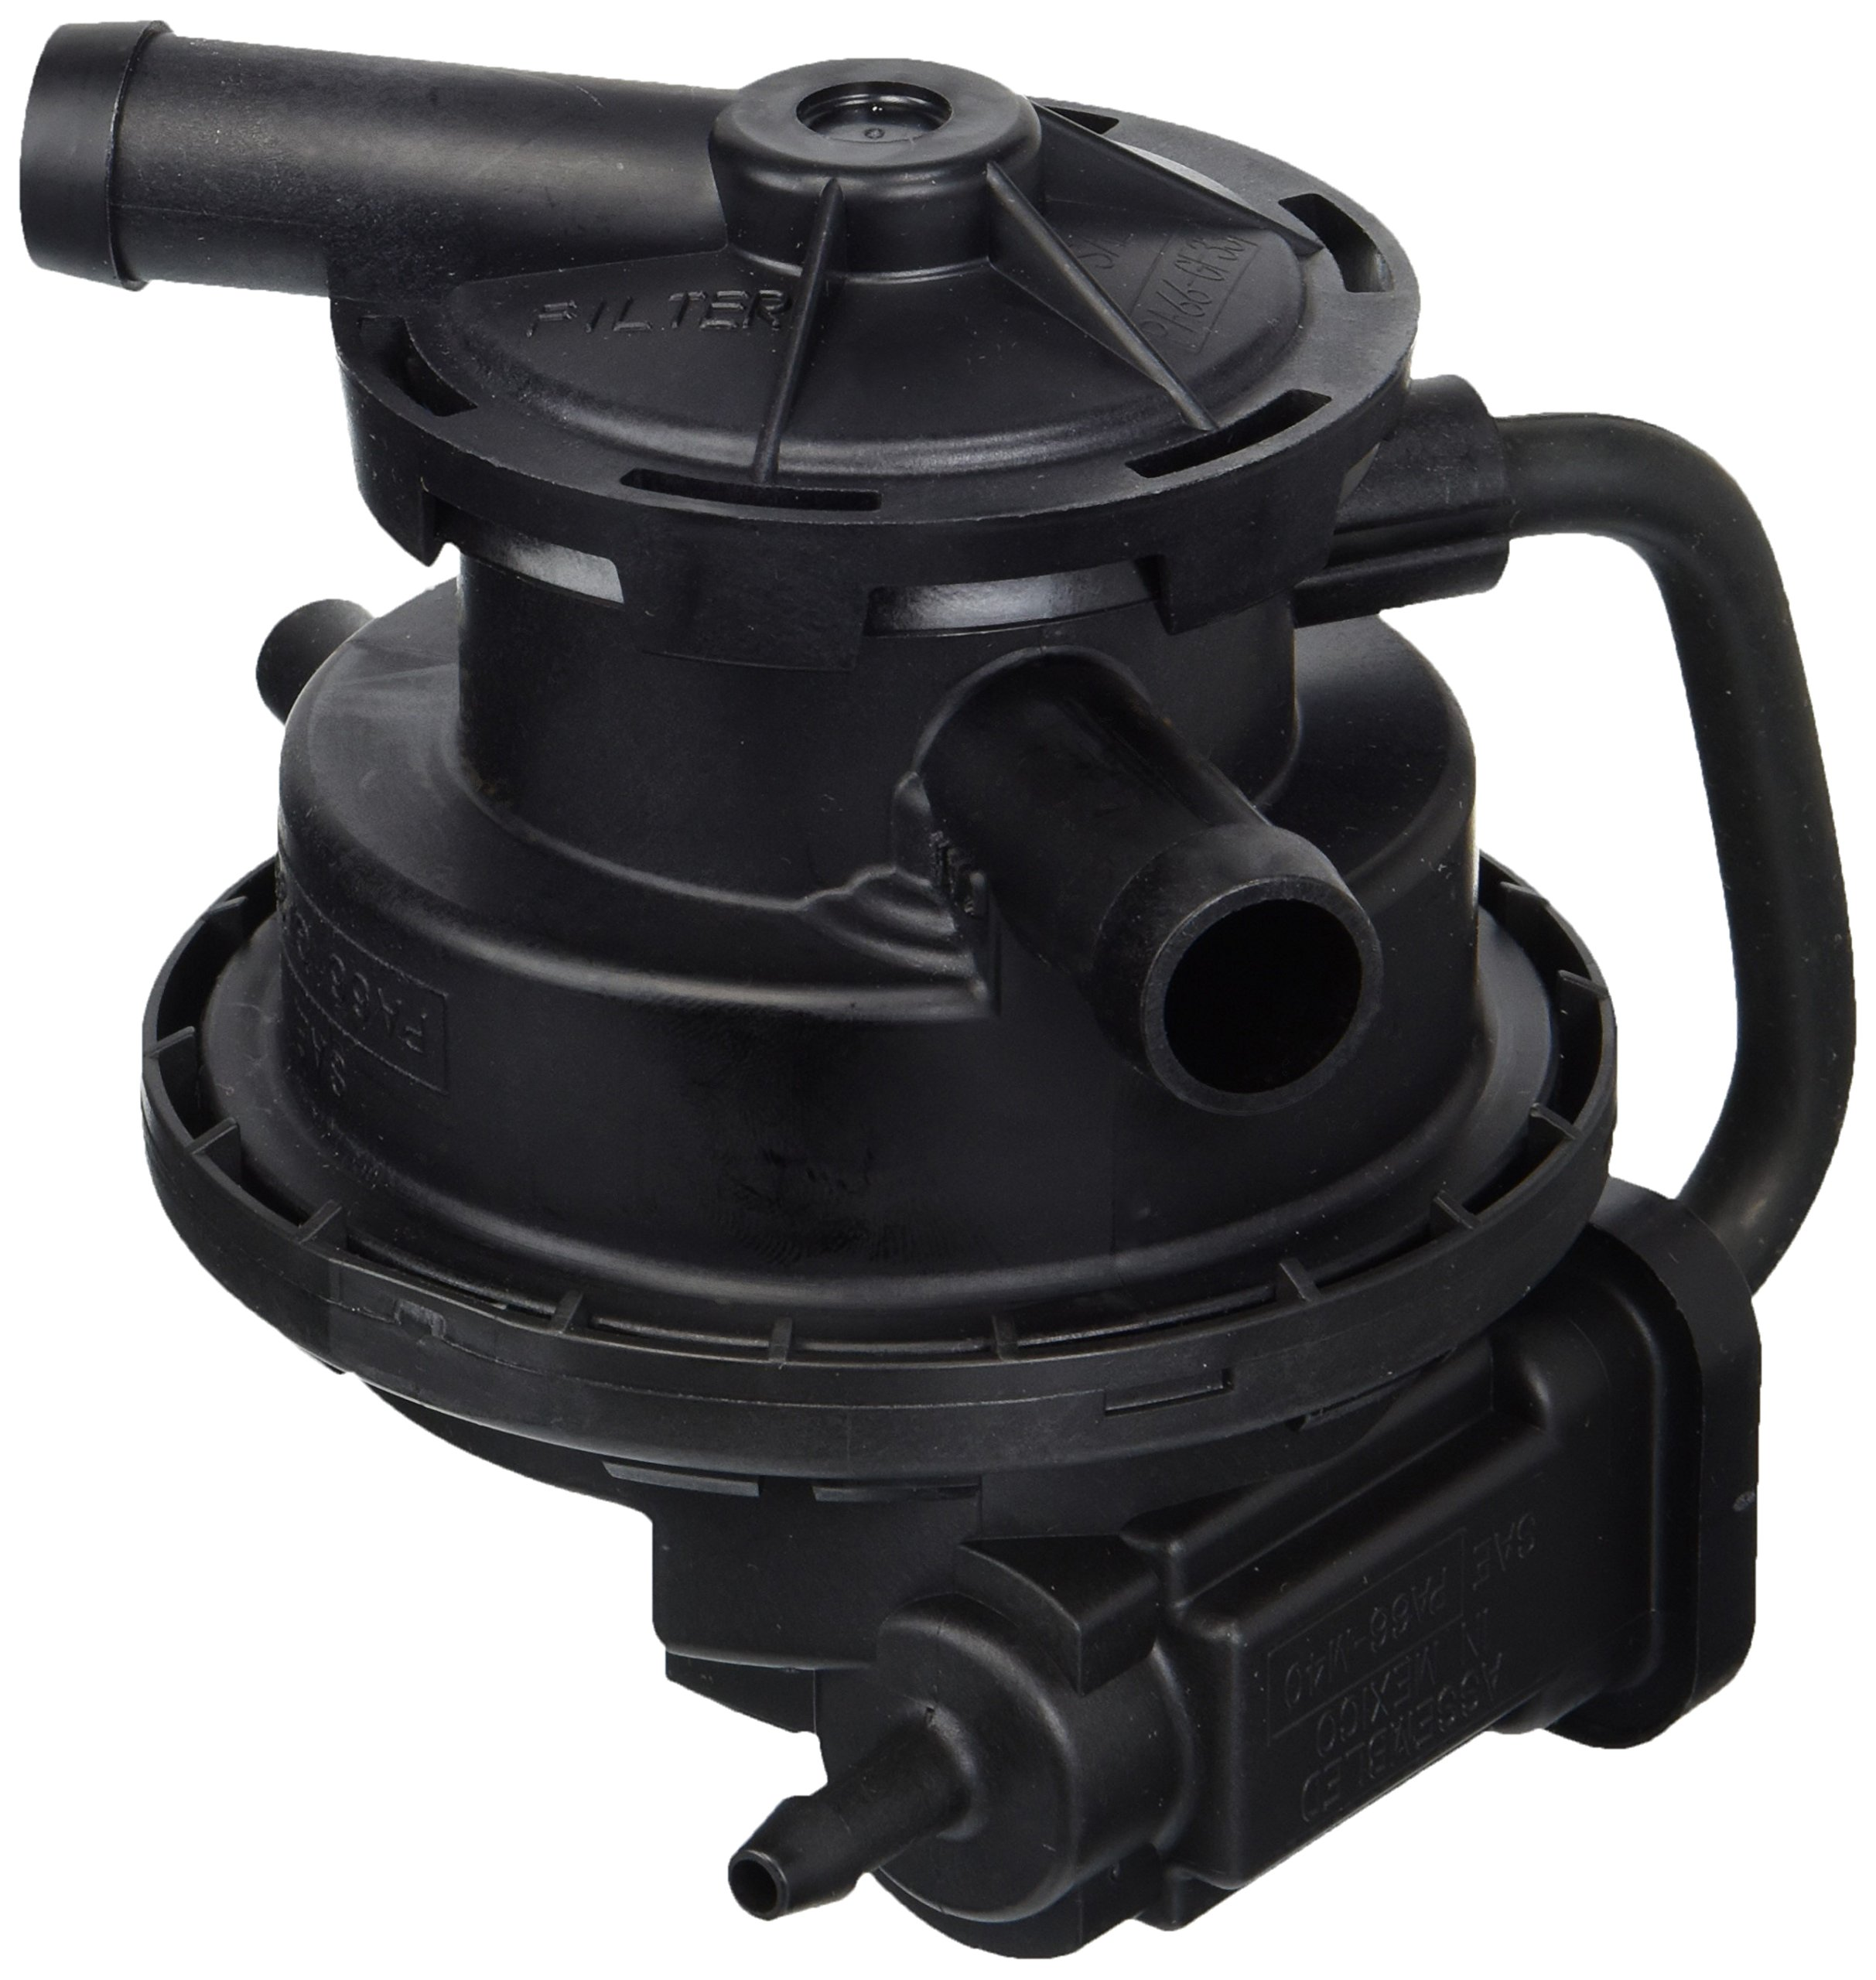 Chrysler Genuine 4891422AD Fuel Leak Detection Pump